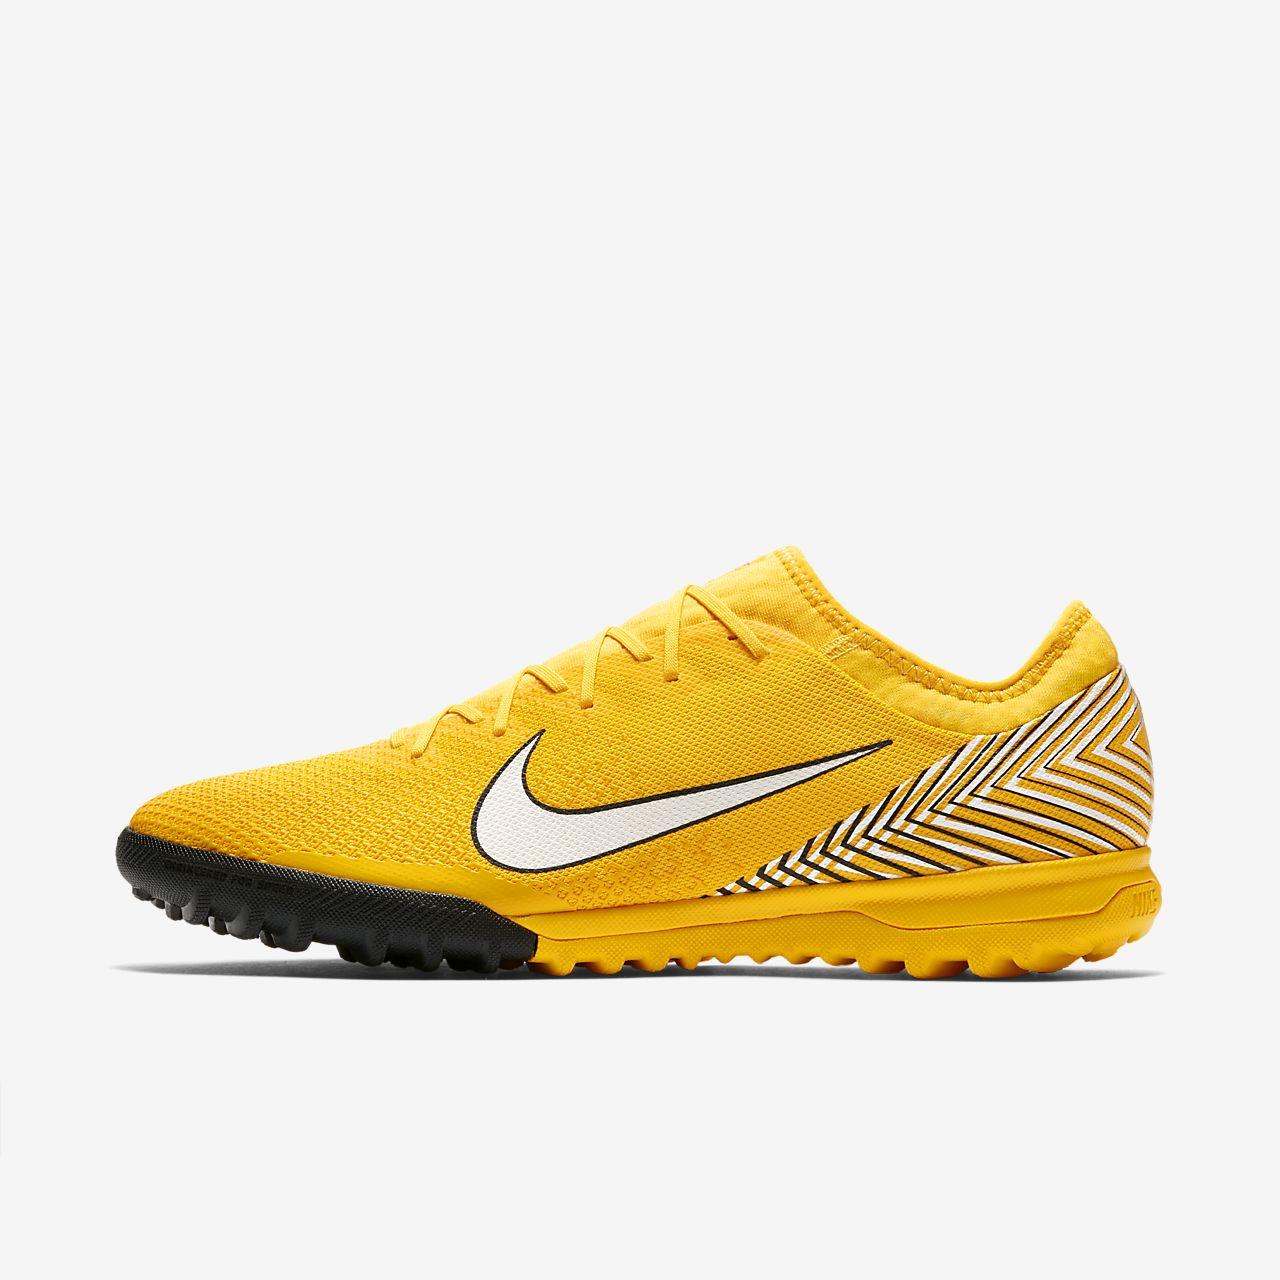 1b7dc0c21 ... switzerland nike mercurial vapor xii pro neymar jr. artificial turf  football shoe c59b2 3a0ed